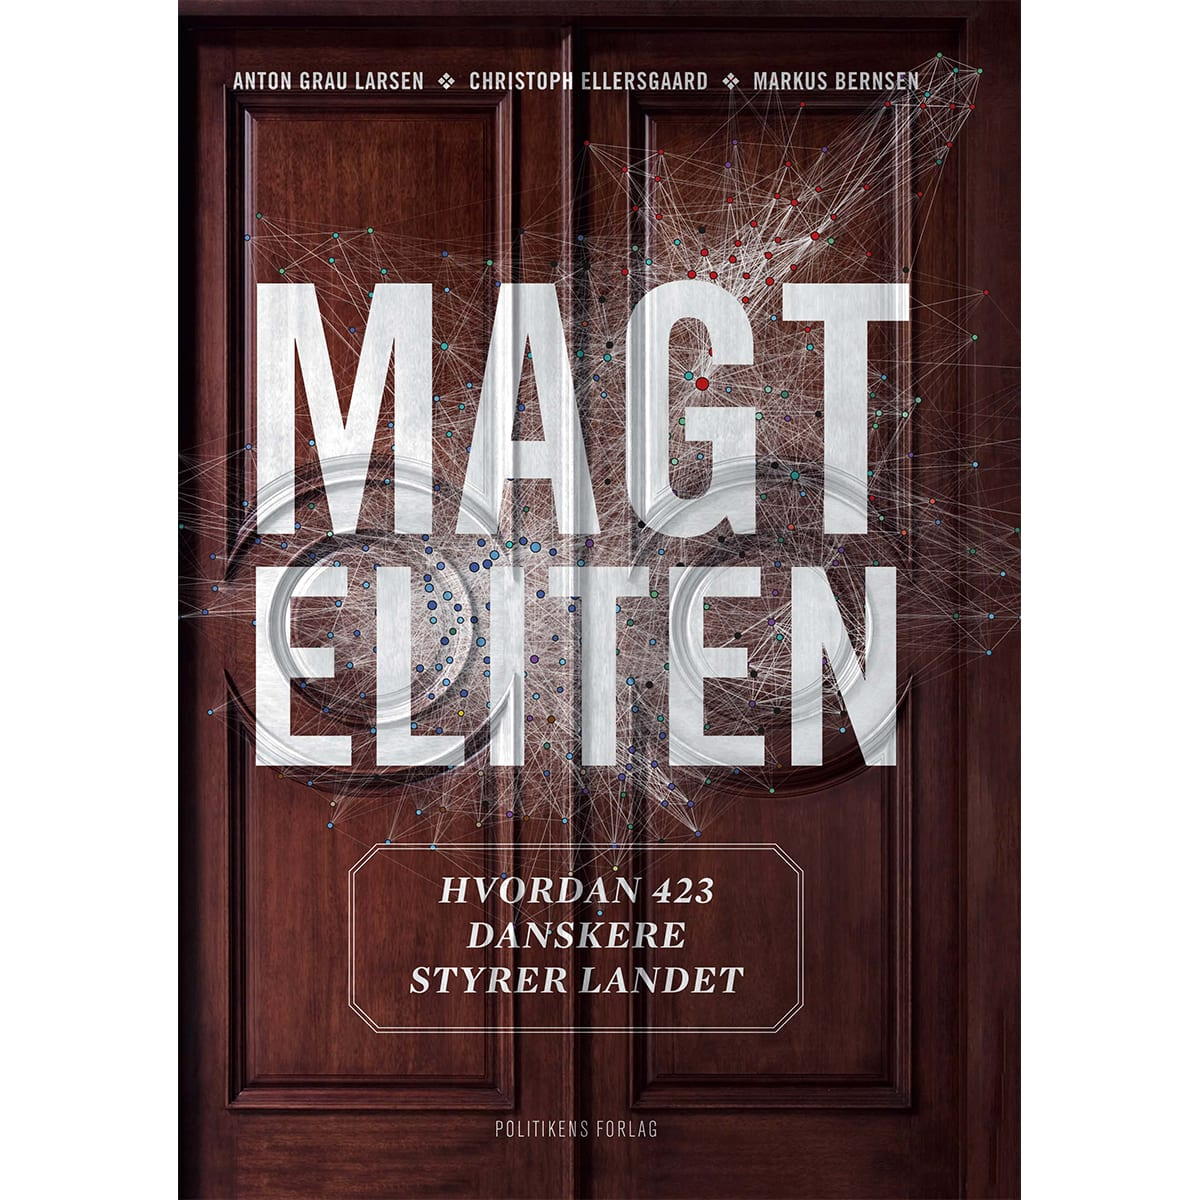 Af Anton Grau Larsen, Christoph Ellersgaard & Markus Bernsen